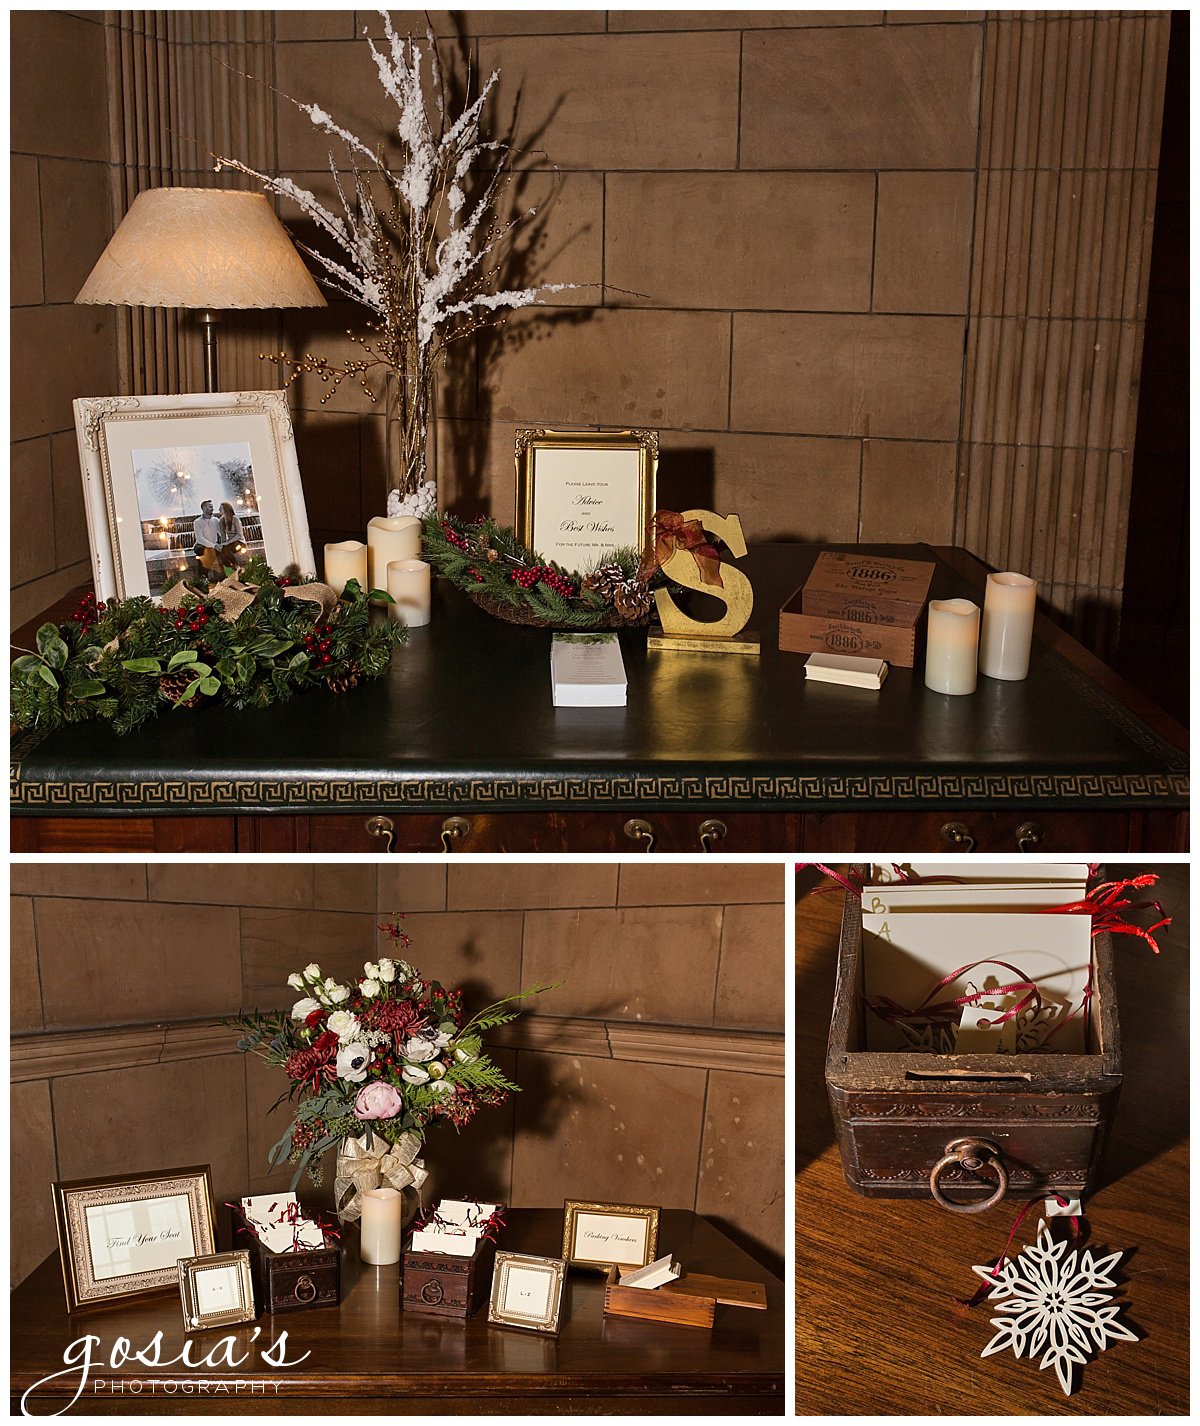 Gosias-Photography-Appleton-wedding-photographer-Saint-Paul-James-J-Hill-Center-ceremony-reception-Minnesota-_0052.jpg